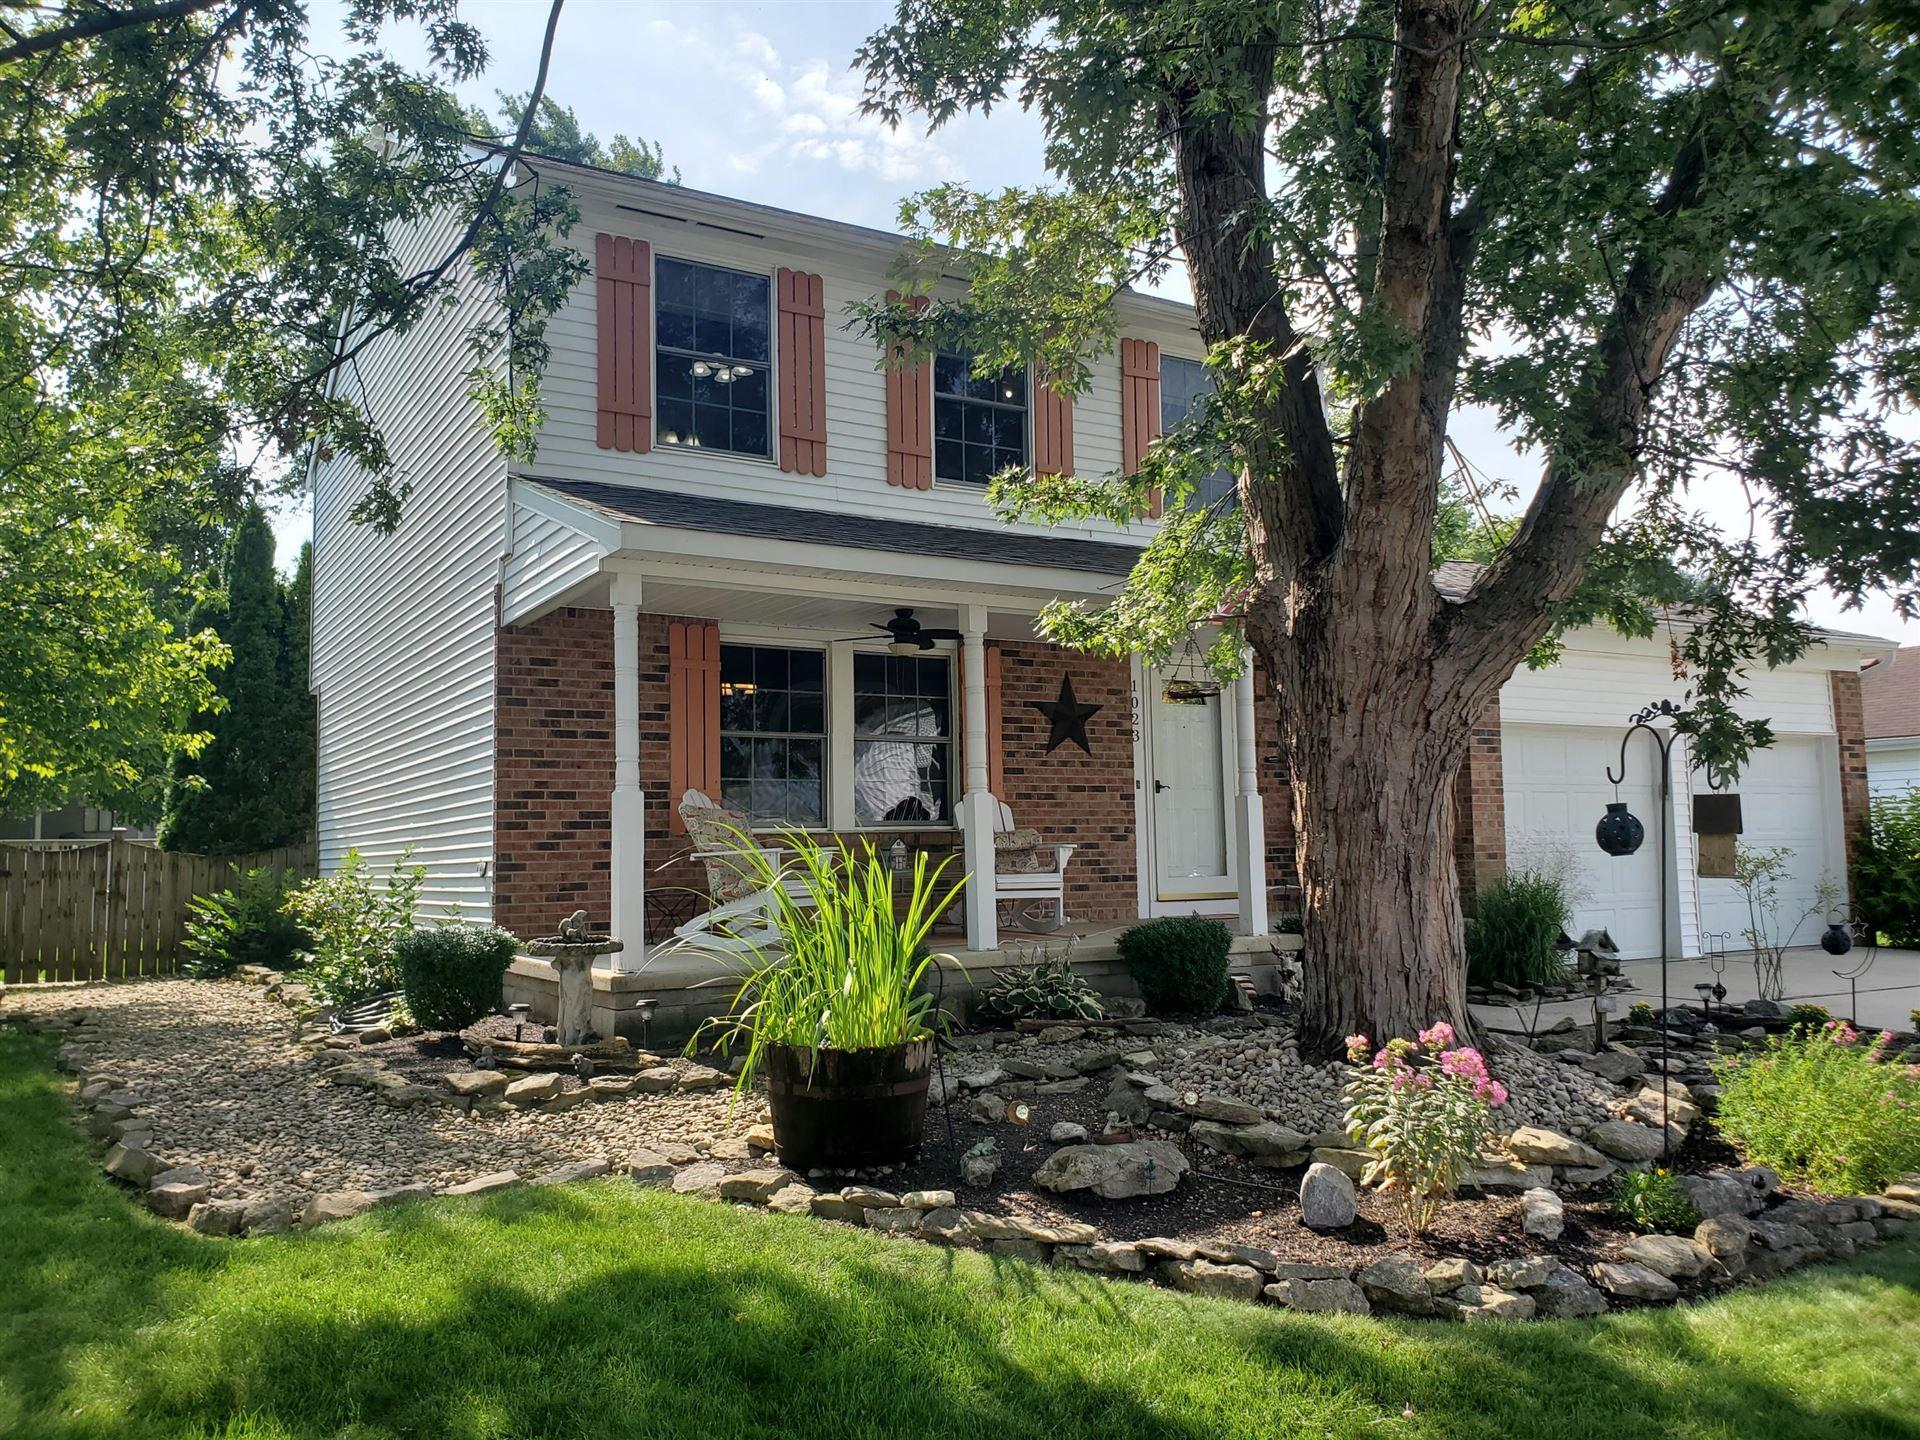 Photo of 1023 Snohomish Avenue, Worthington, OH 43085 (MLS # 221031361)